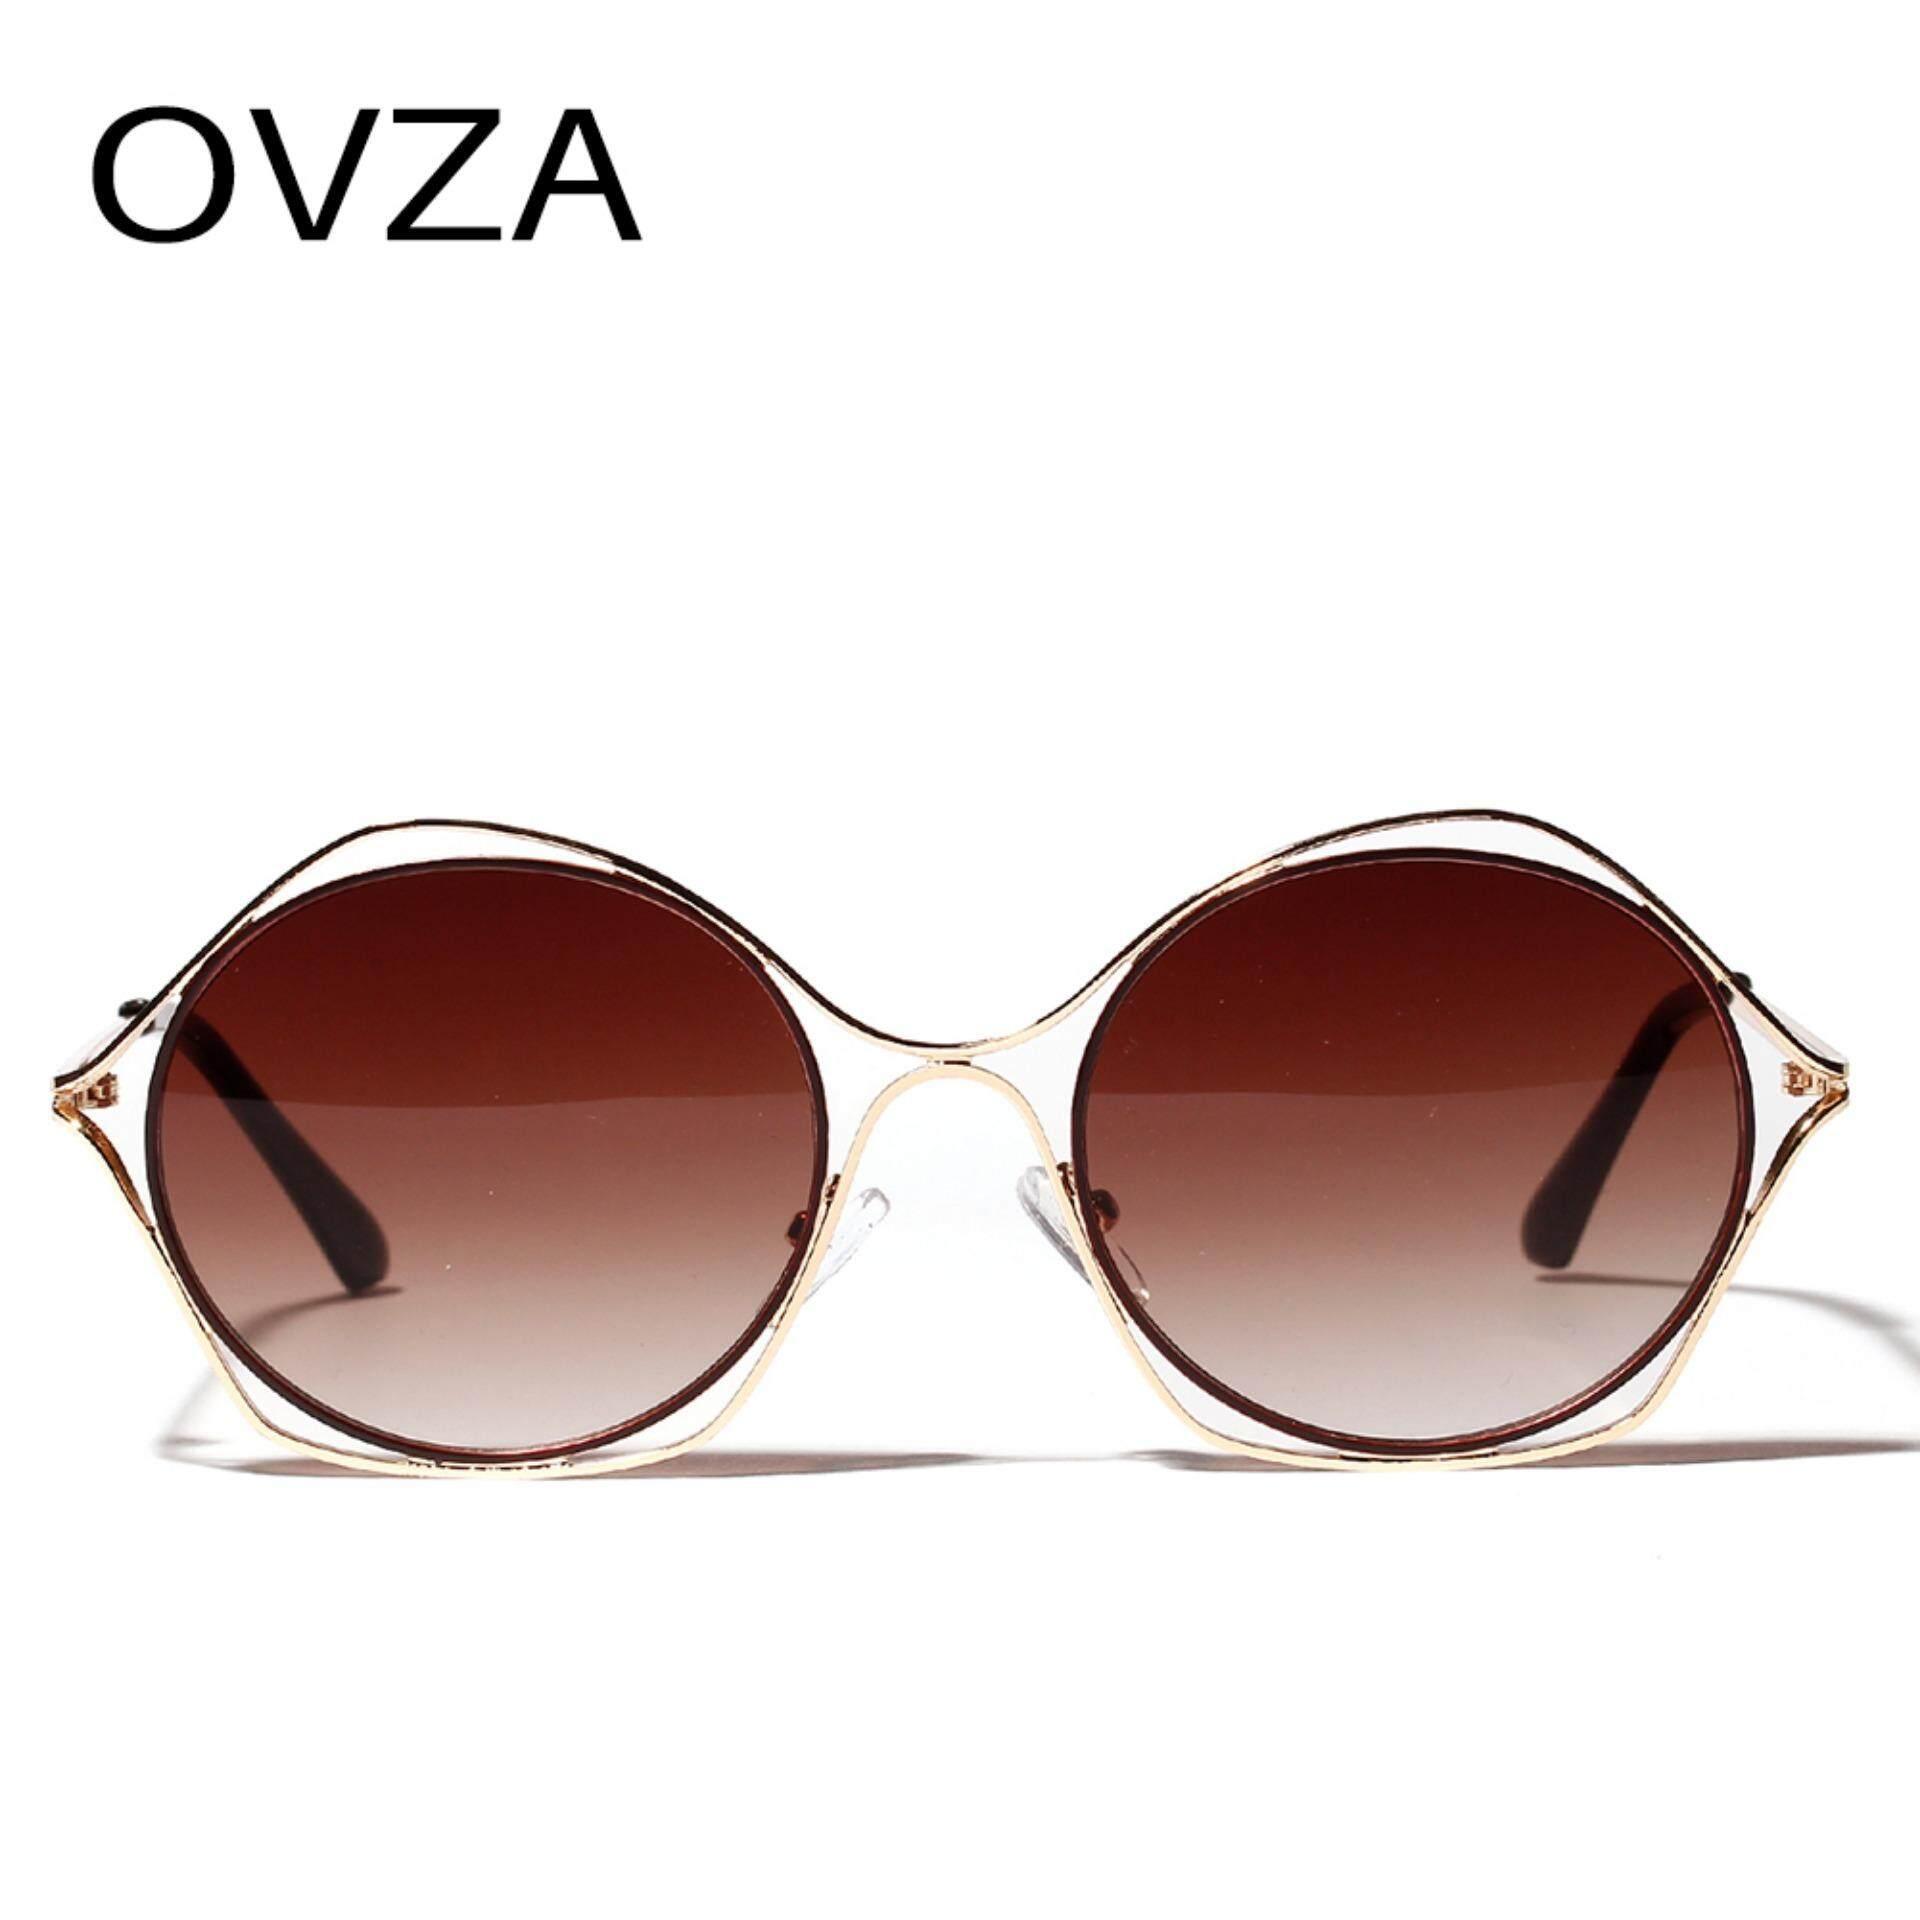 b6cfa4cc98b8 OVZA Brand Designer Luxury Sunglasses for Women Openwork Fashion Cat Eye  Sunglasses High Quality 2019 New